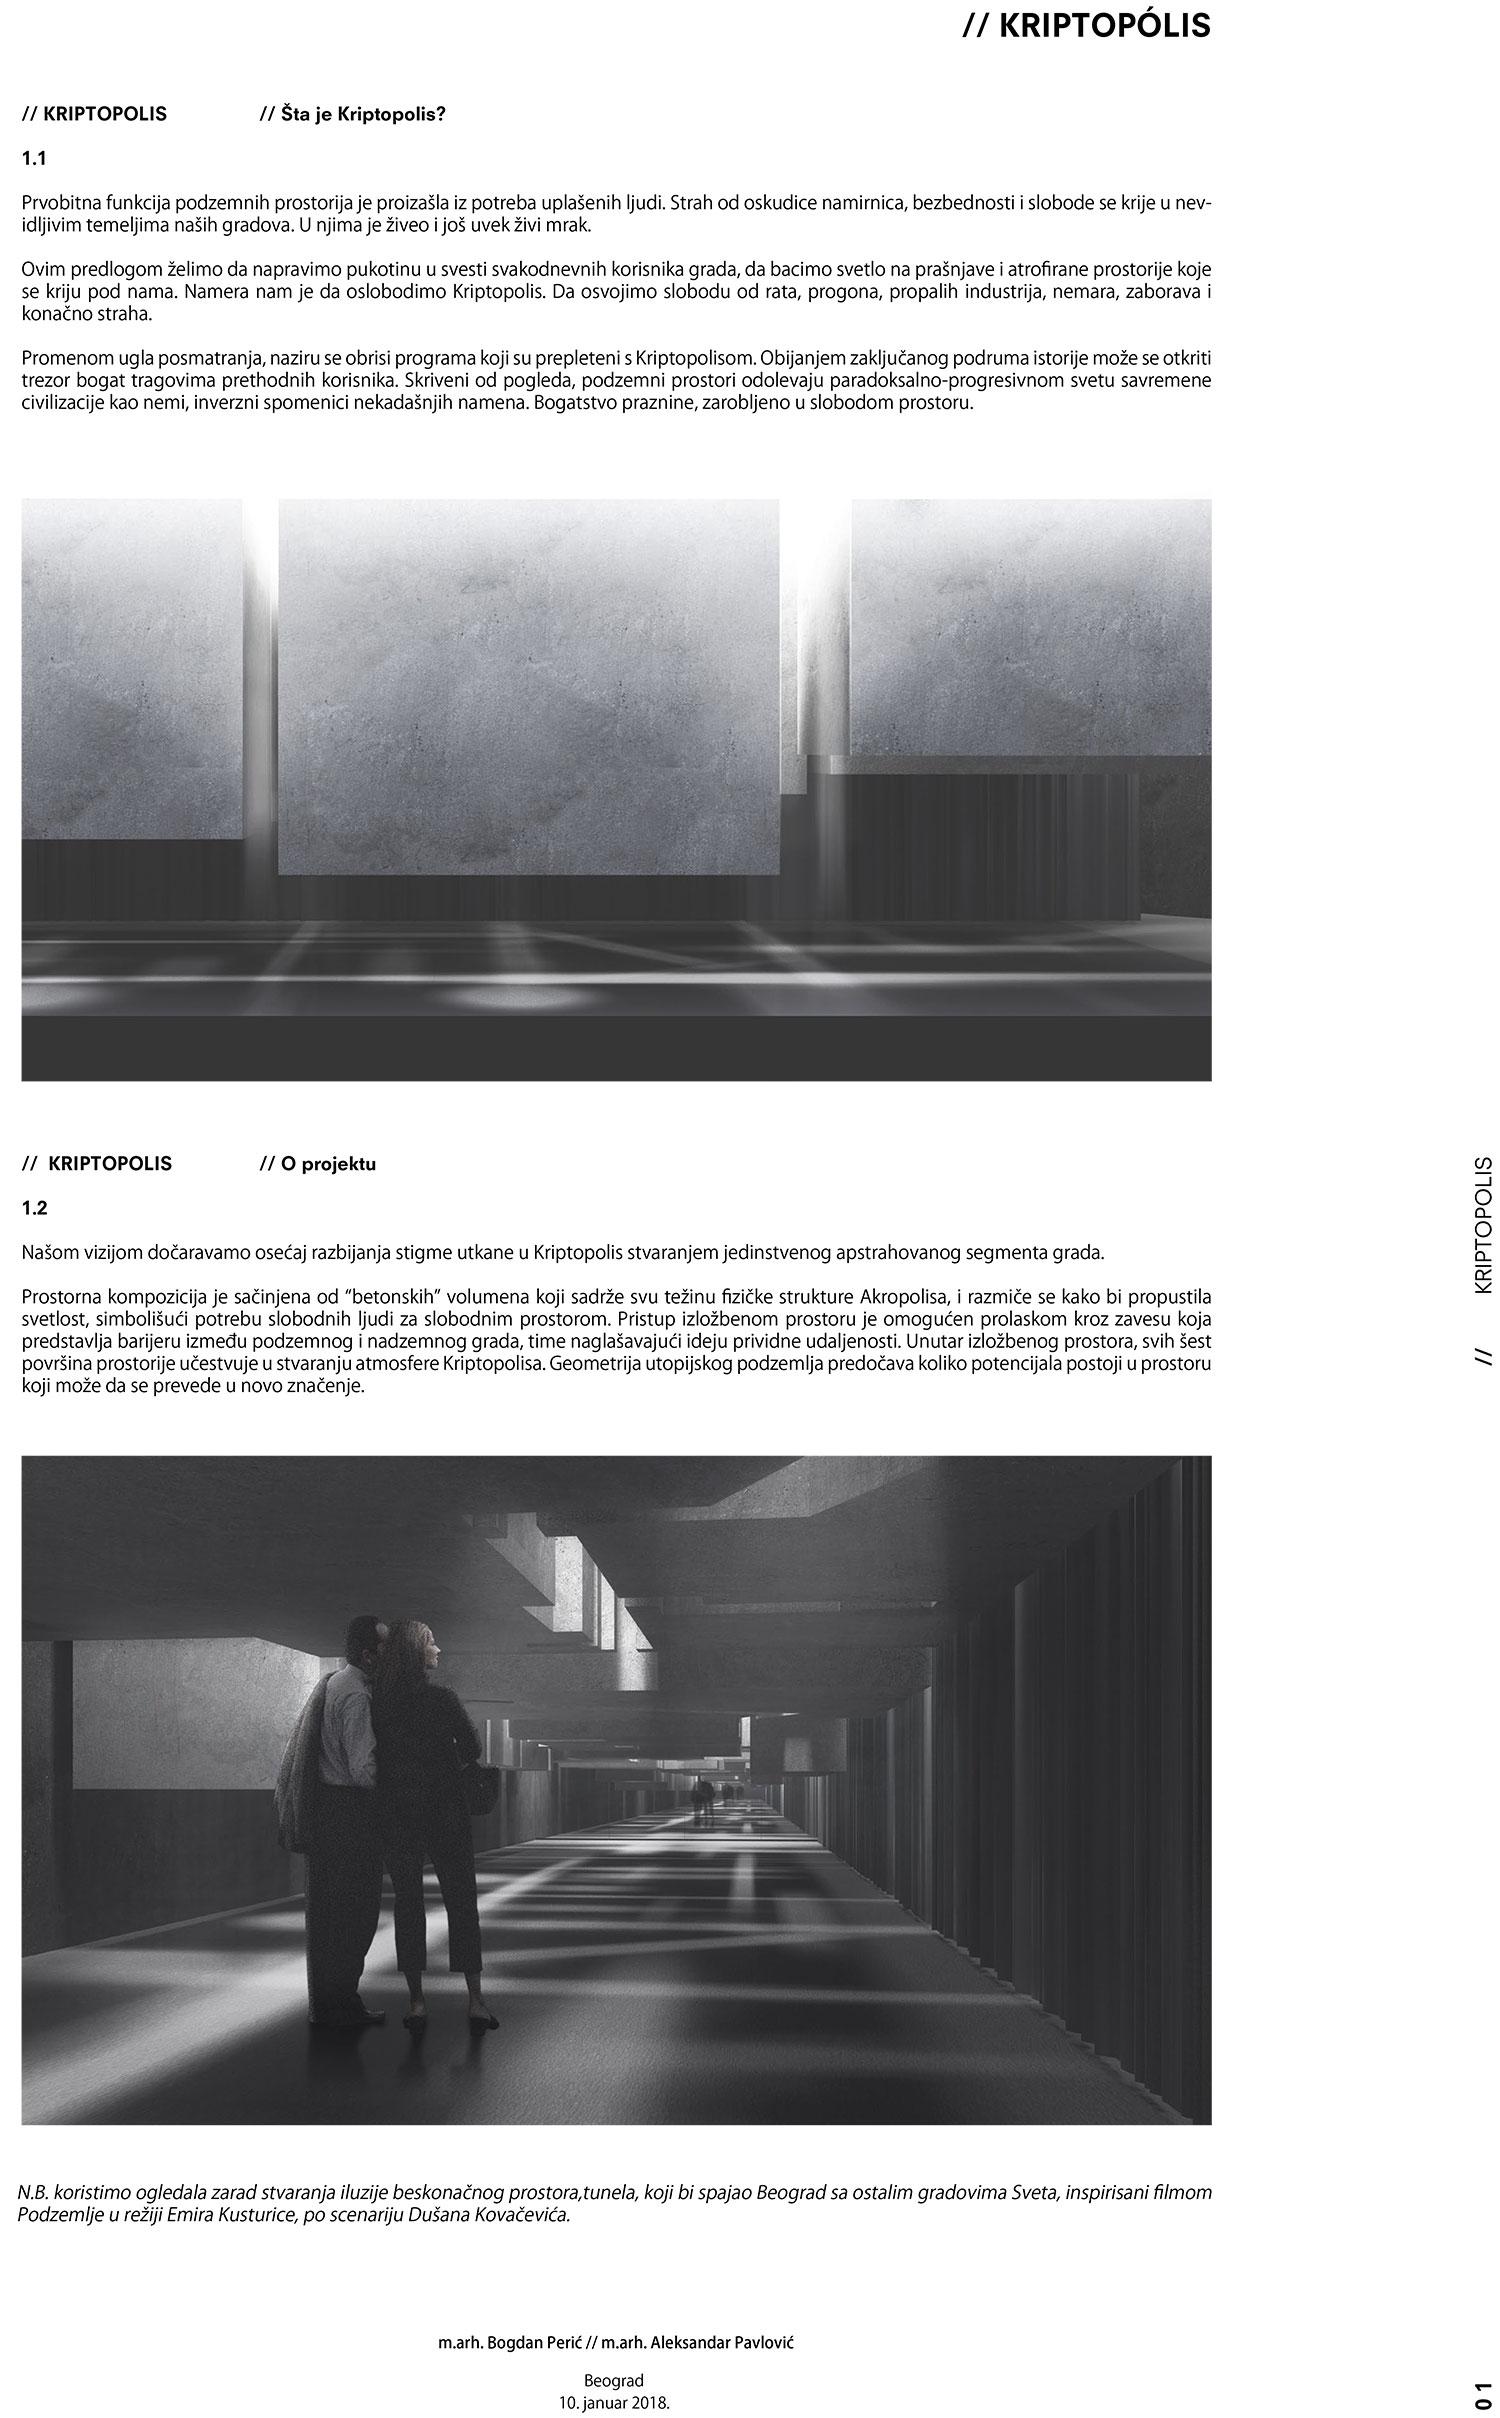 La-Biennale-di-Venezia-2018_Kriptopolis-Plakat-1